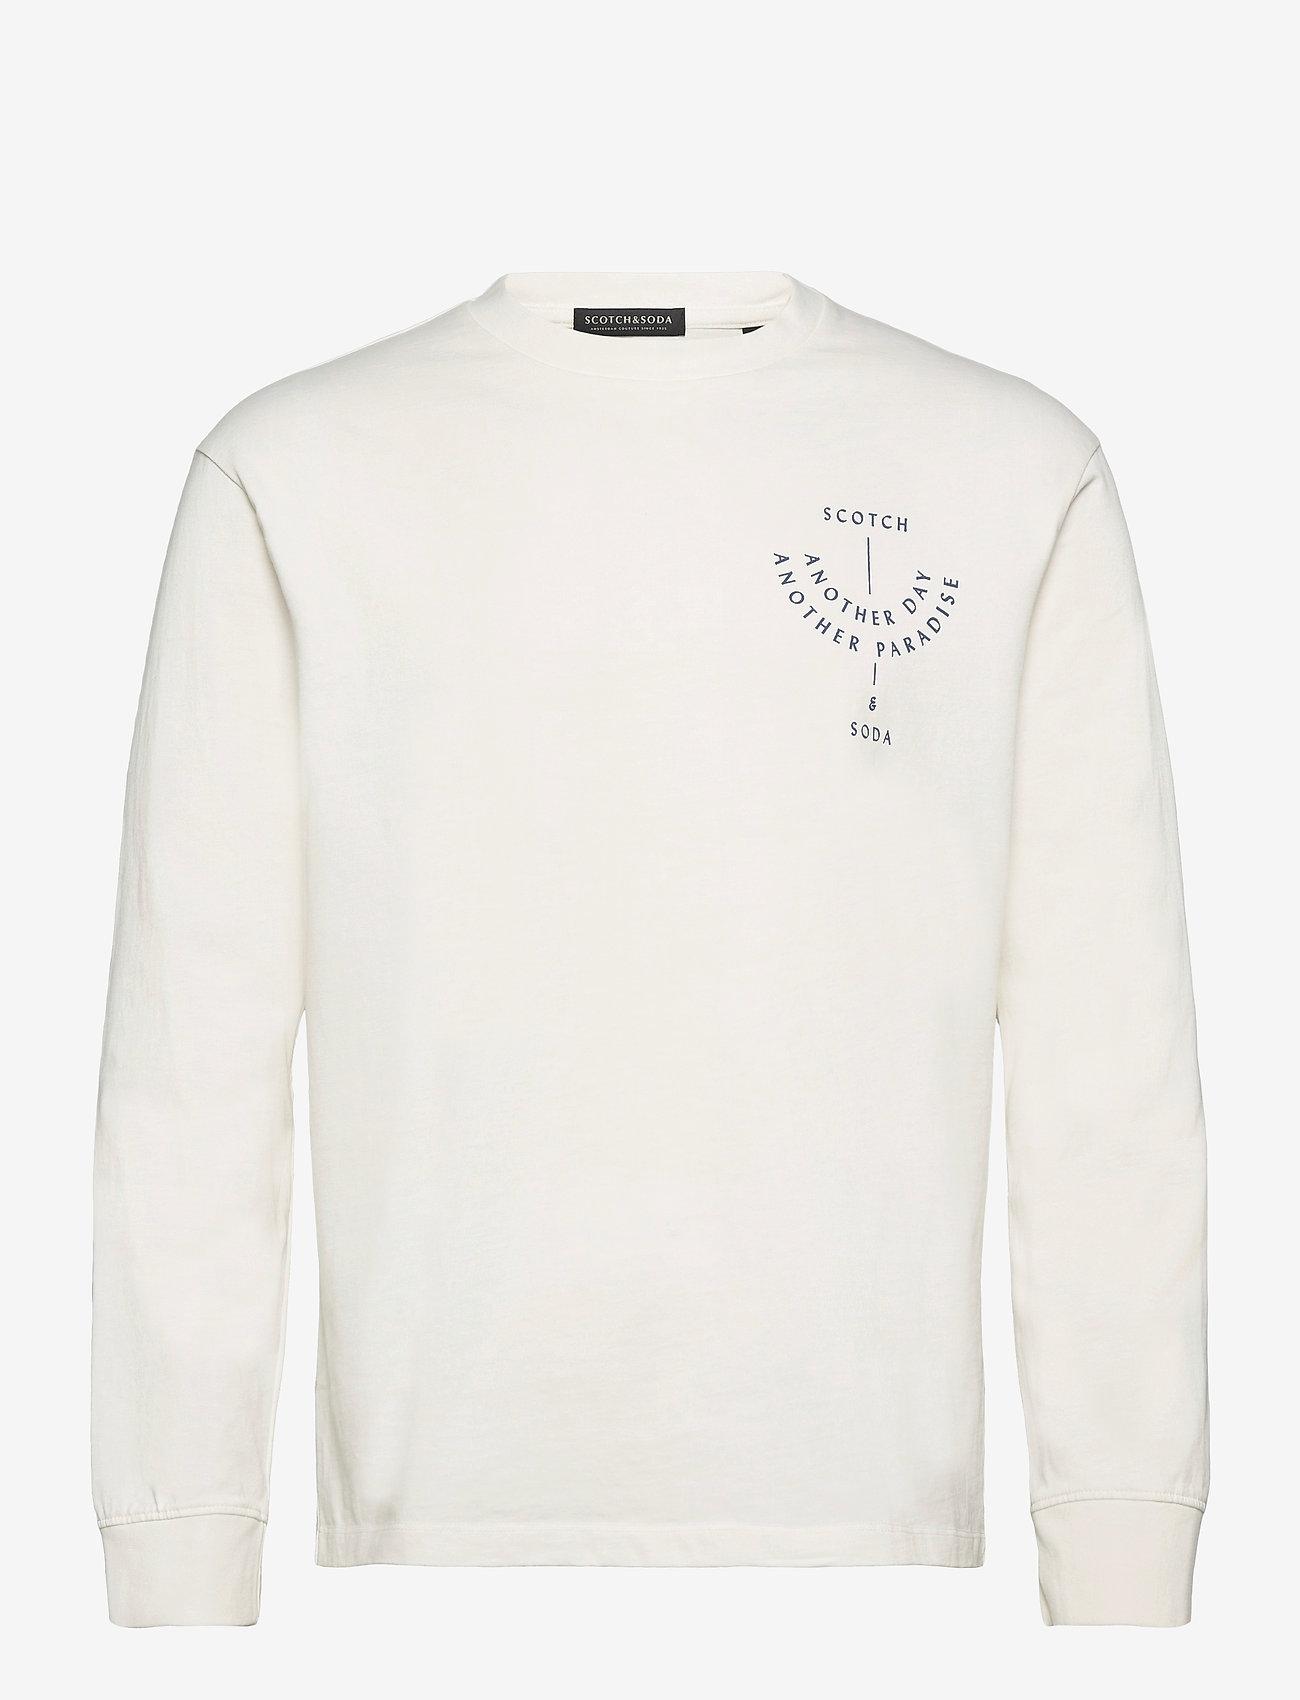 Scotch & Soda - Organic cotton-jersey longsleeve artwork tee - podstawowe koszulki - denim white - 0